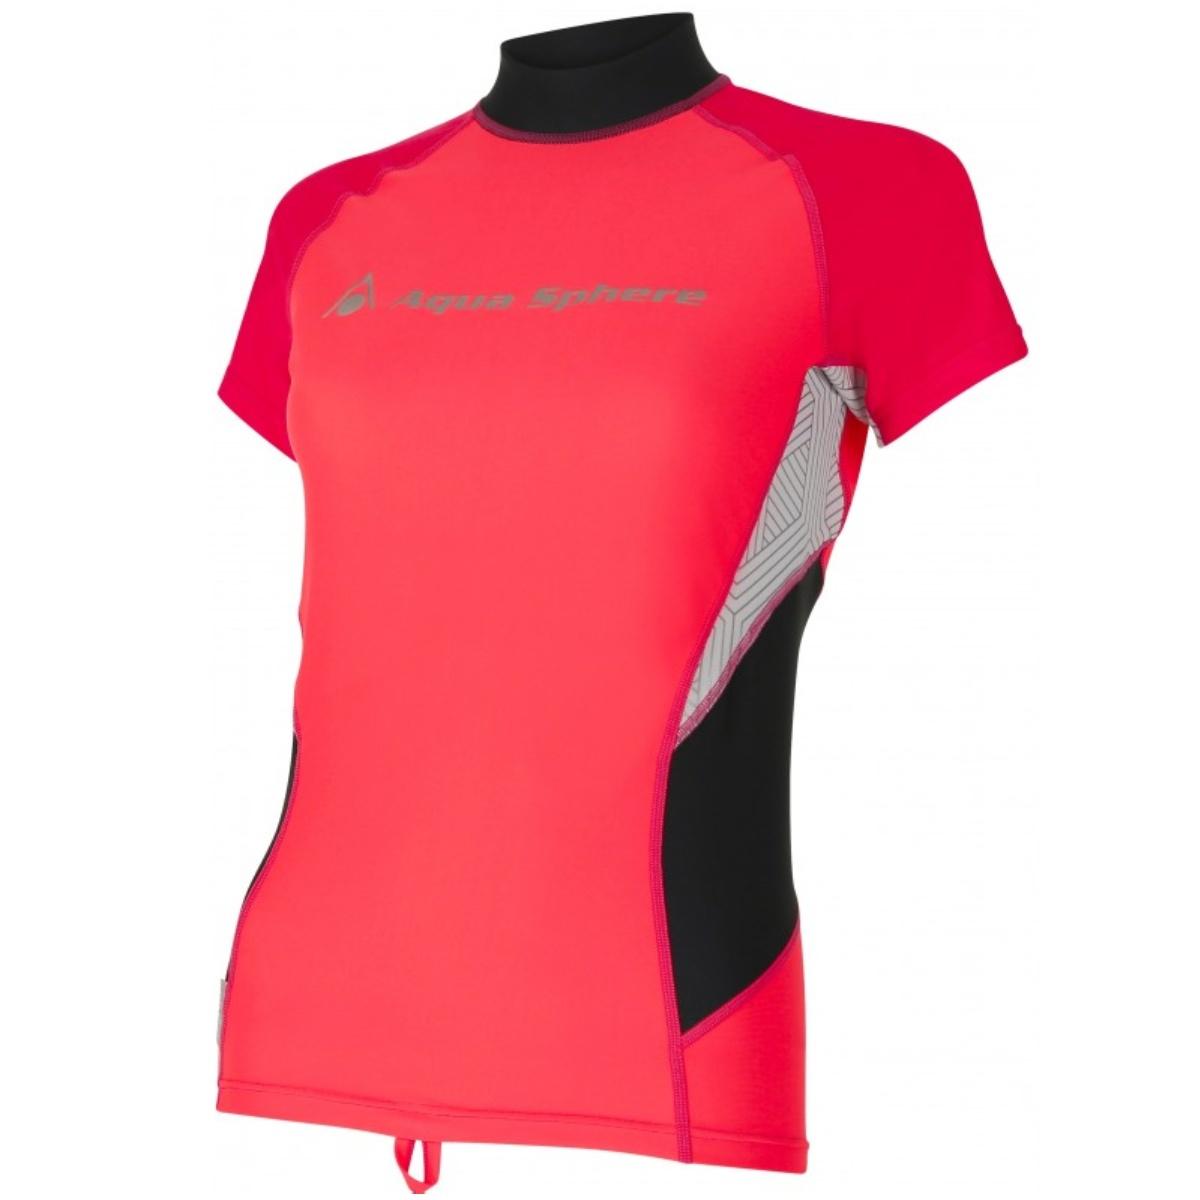 Lycrové triko AQUA SPHERE Amy dámské růžové - vel. XS